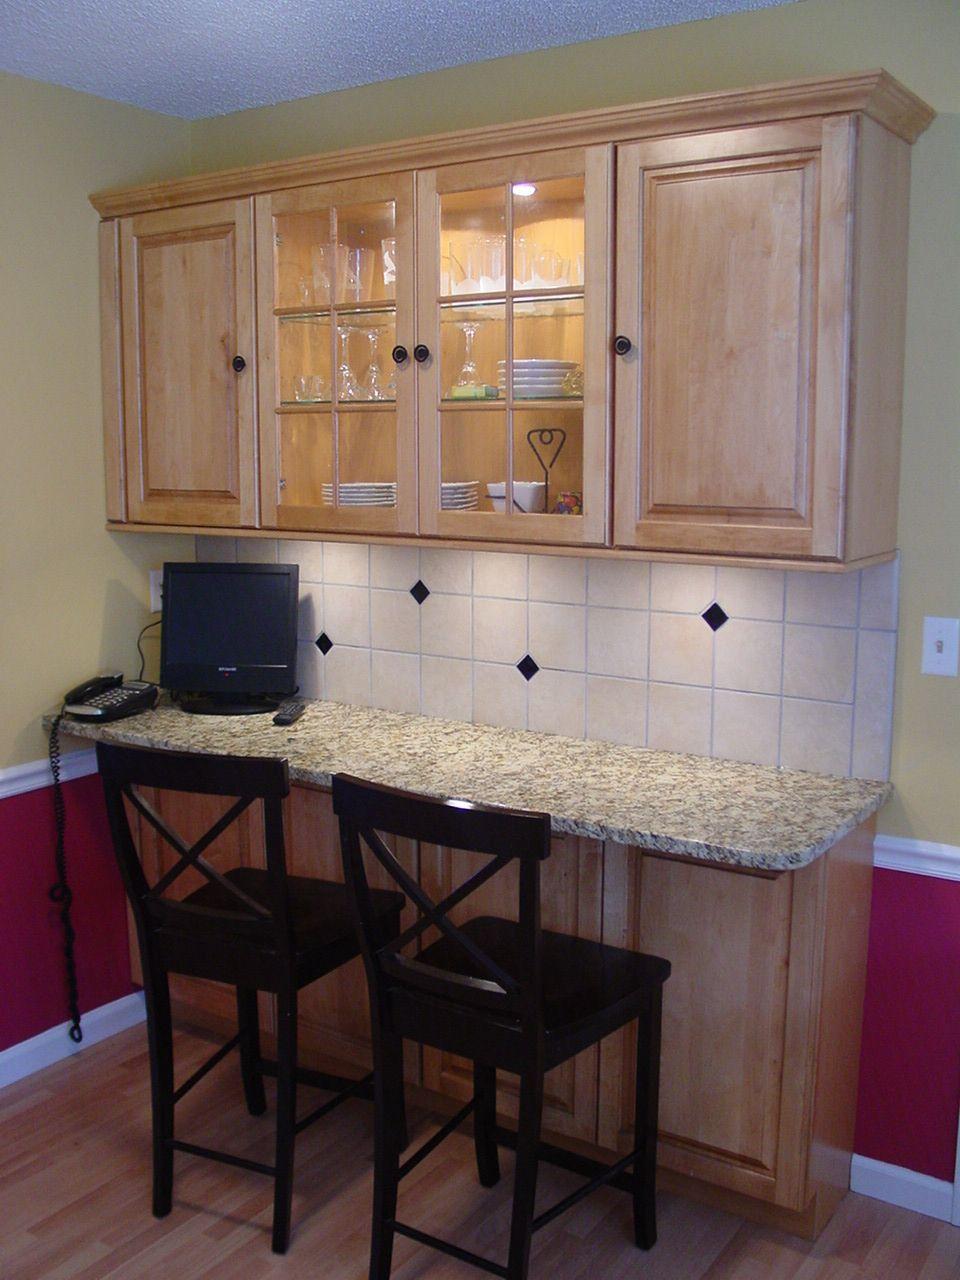 Kitchen Breakfast Bar Witconstruction Thetileshop Breakfast Bar Kitchen Living Room Kitchen Kitchen Bar